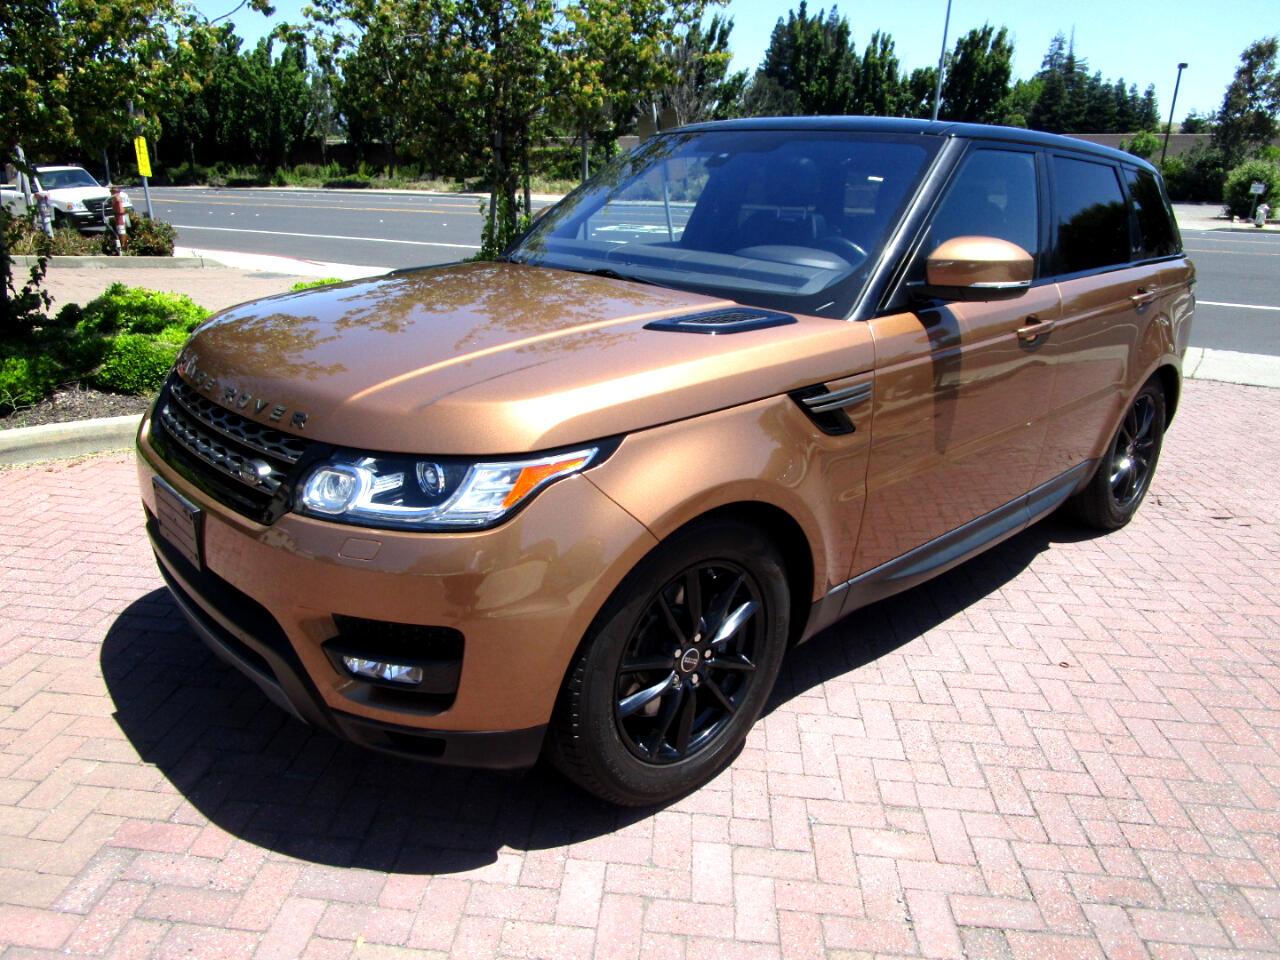 2016 Land Rover Range Rover Sport SUPERCHARGED 3.0 LITER**HEAT SEATS*PANO*BLIND SPOT